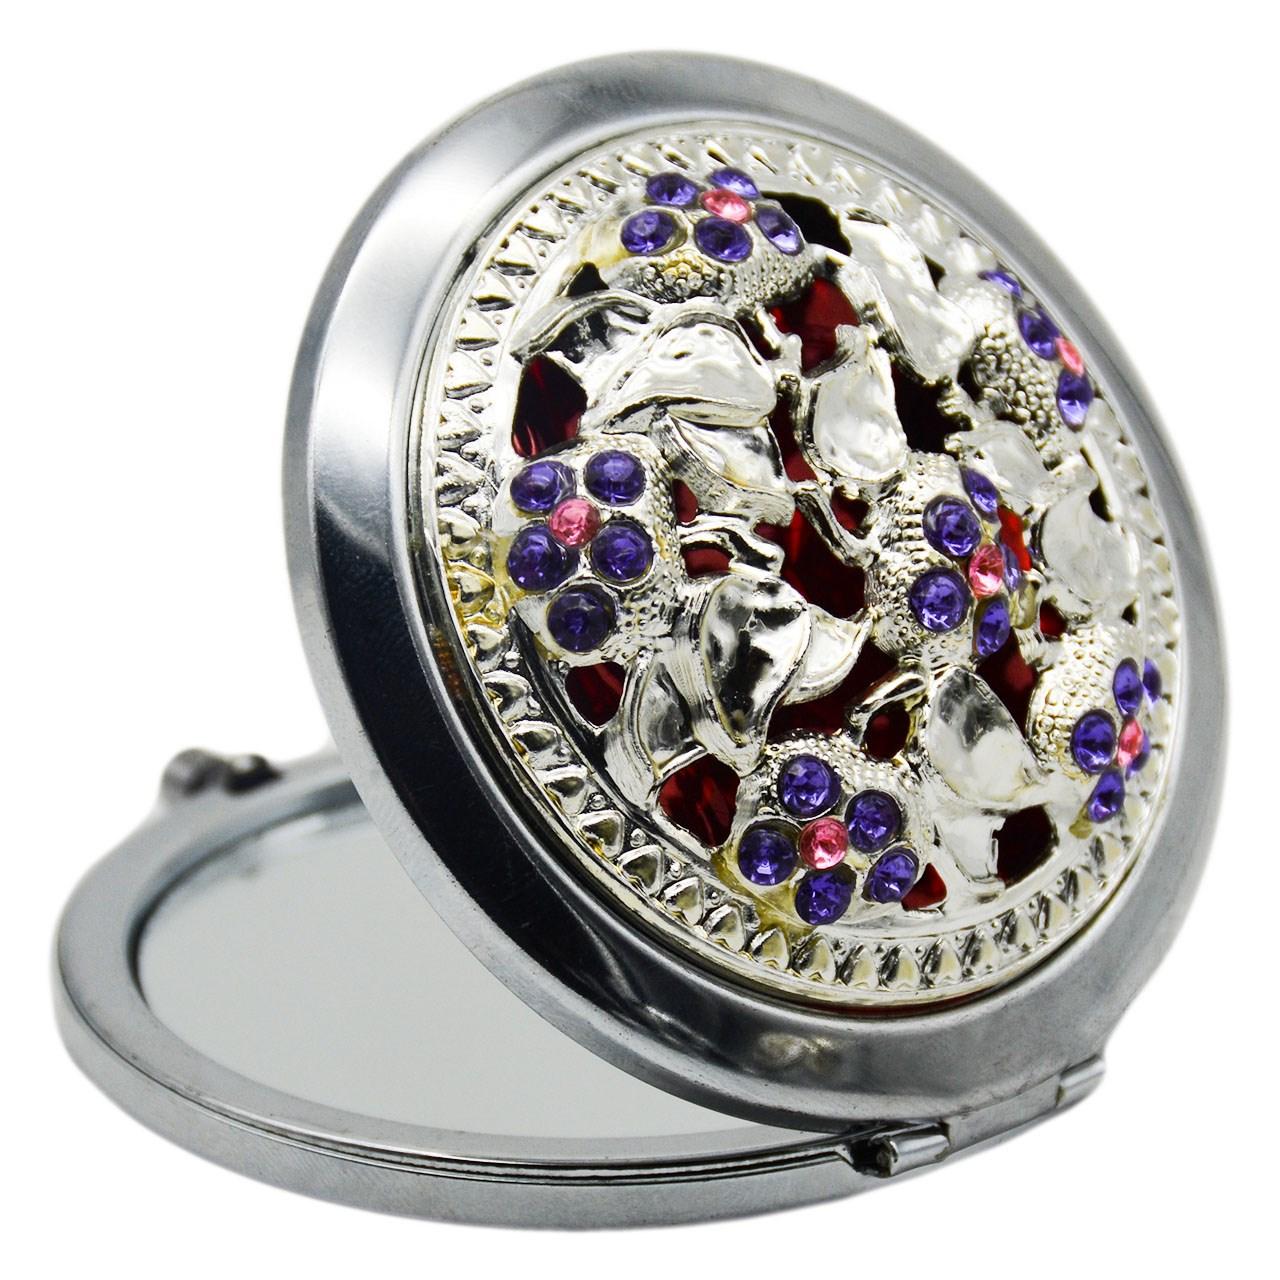 قیمت آینه جیبی کد 1002